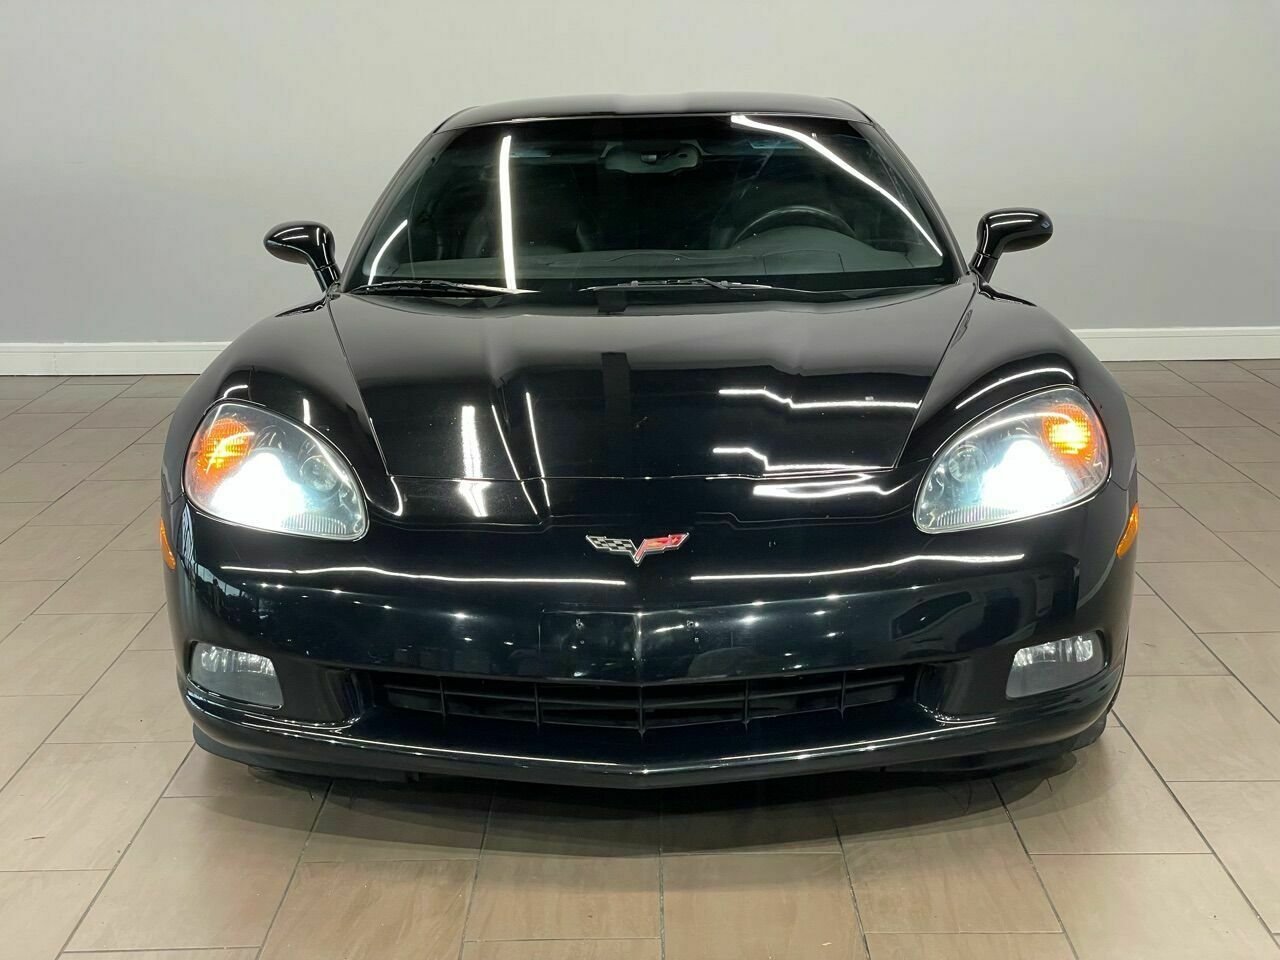 2010 Black Chevrolet Corvette     C6 Corvette Photo 6